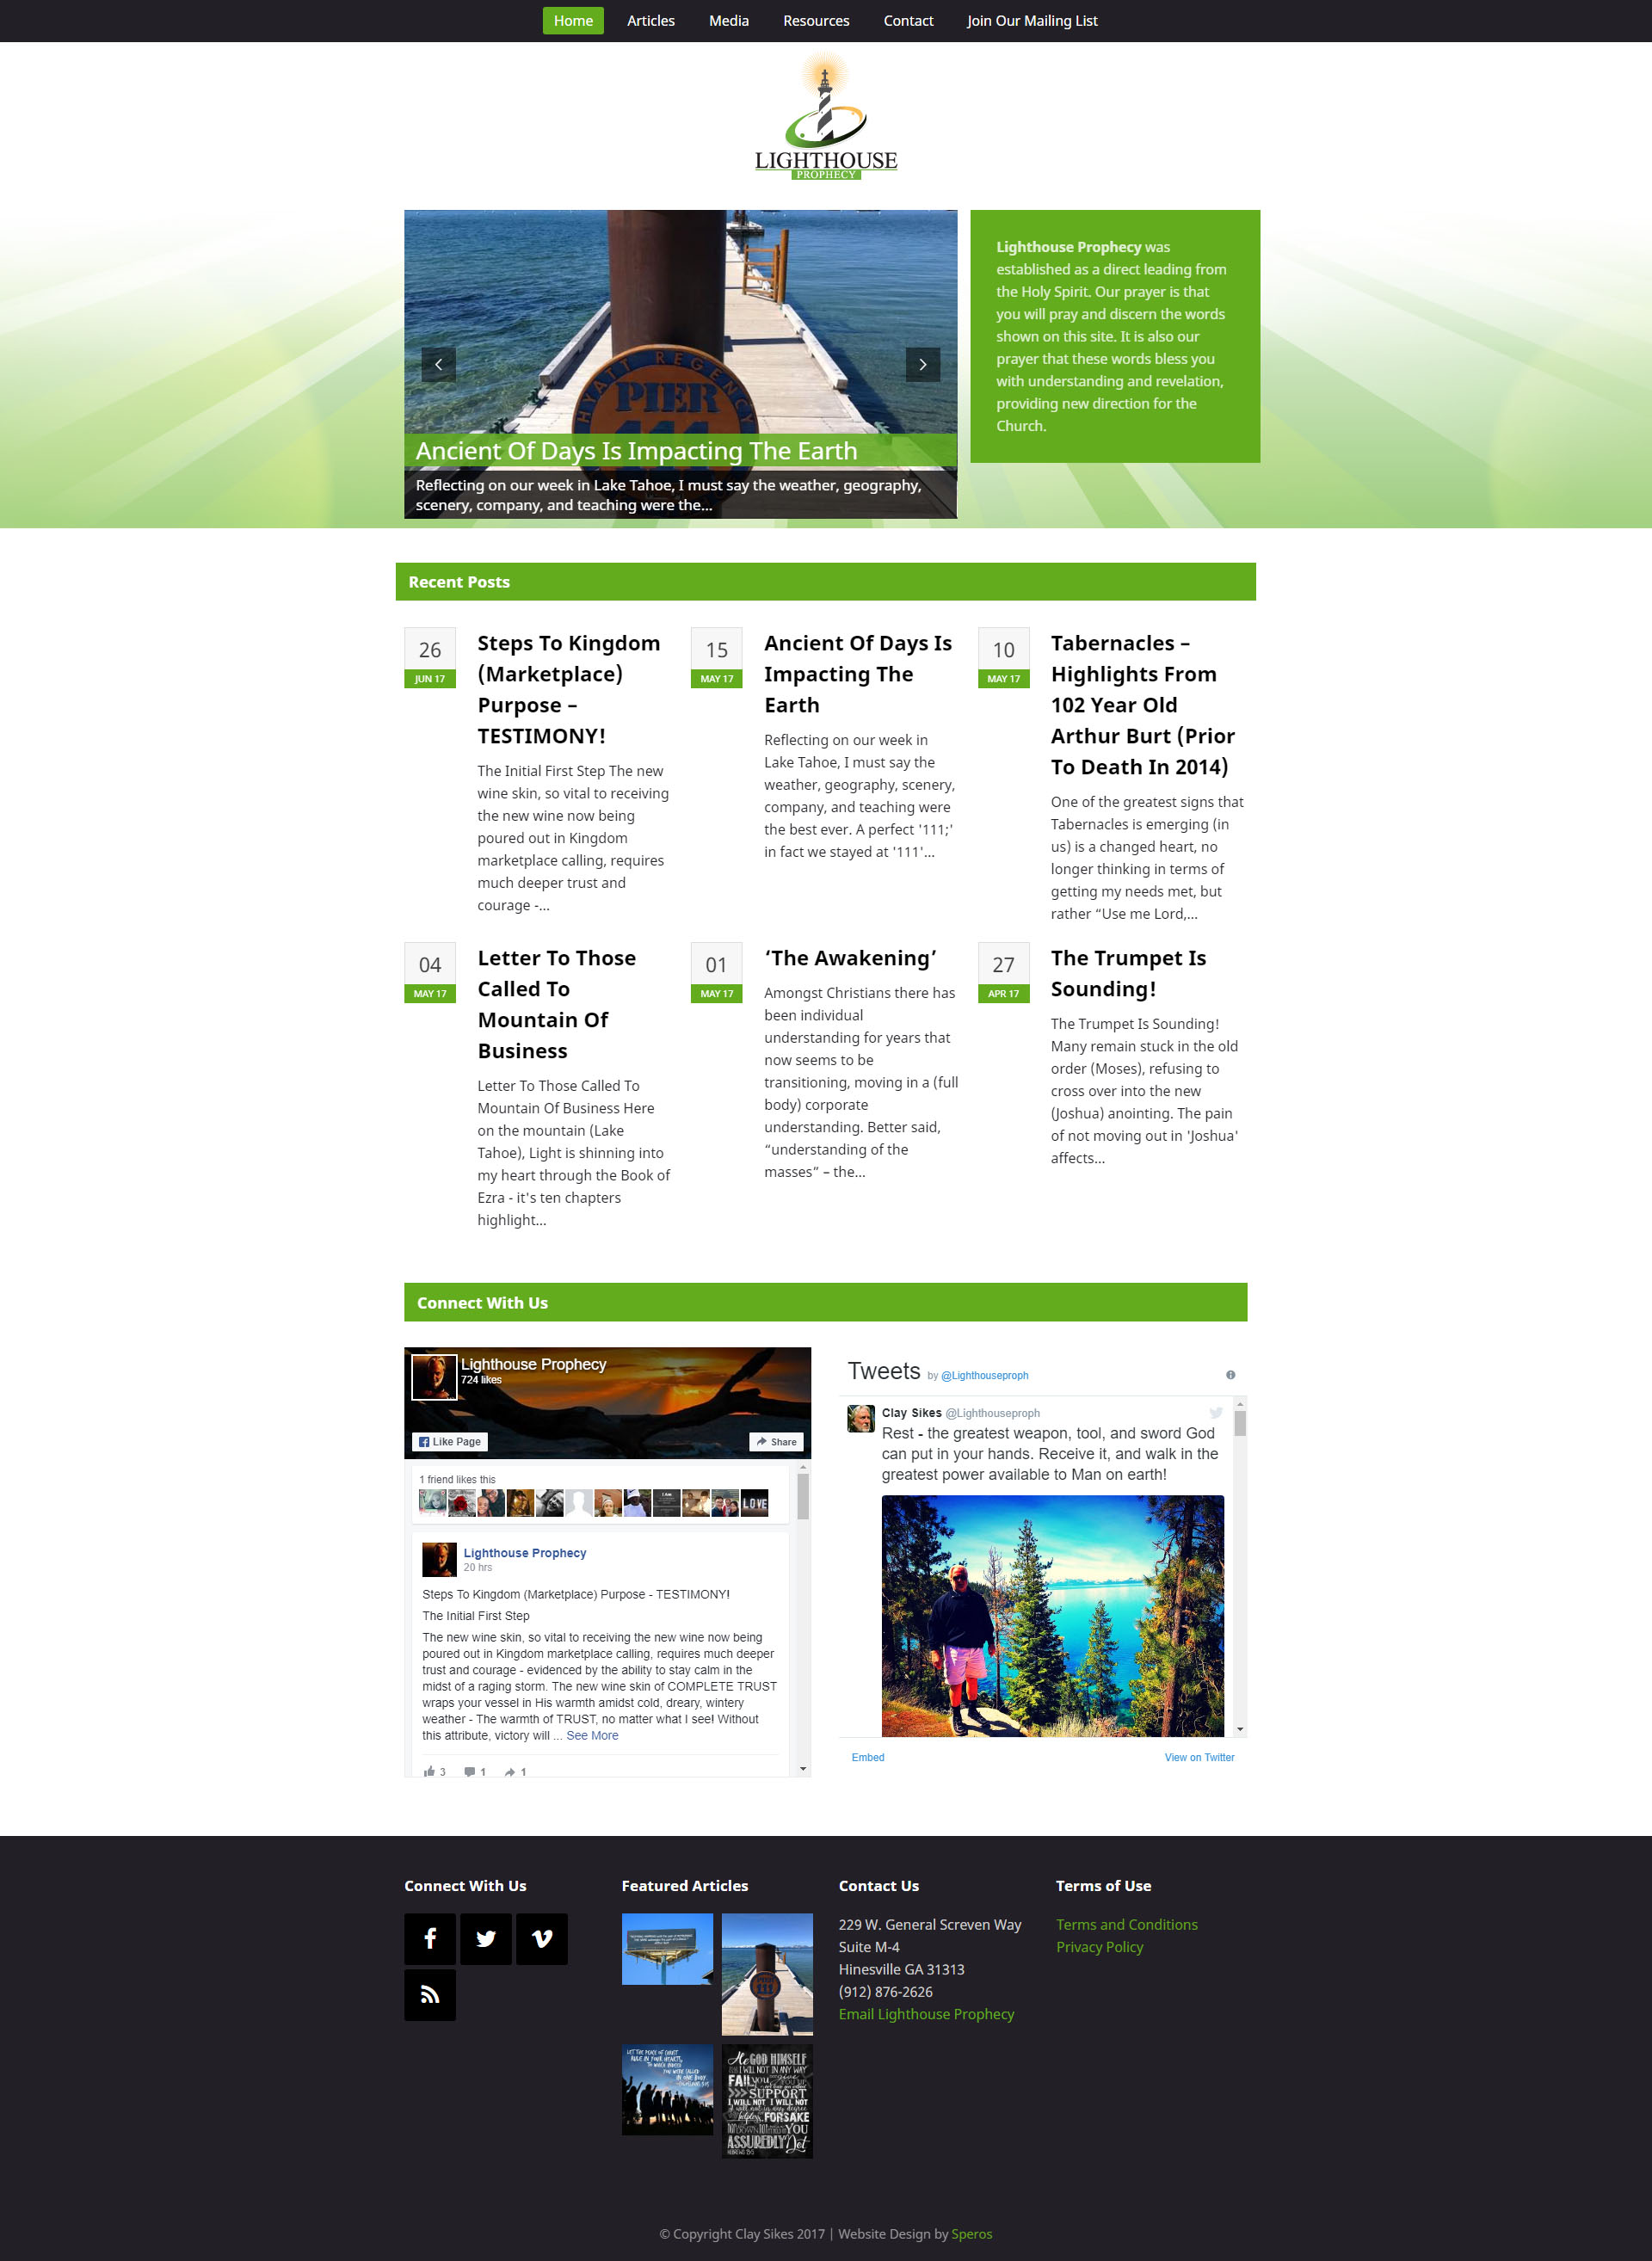 Light House Prophecy - Speros Web Design - Savannah